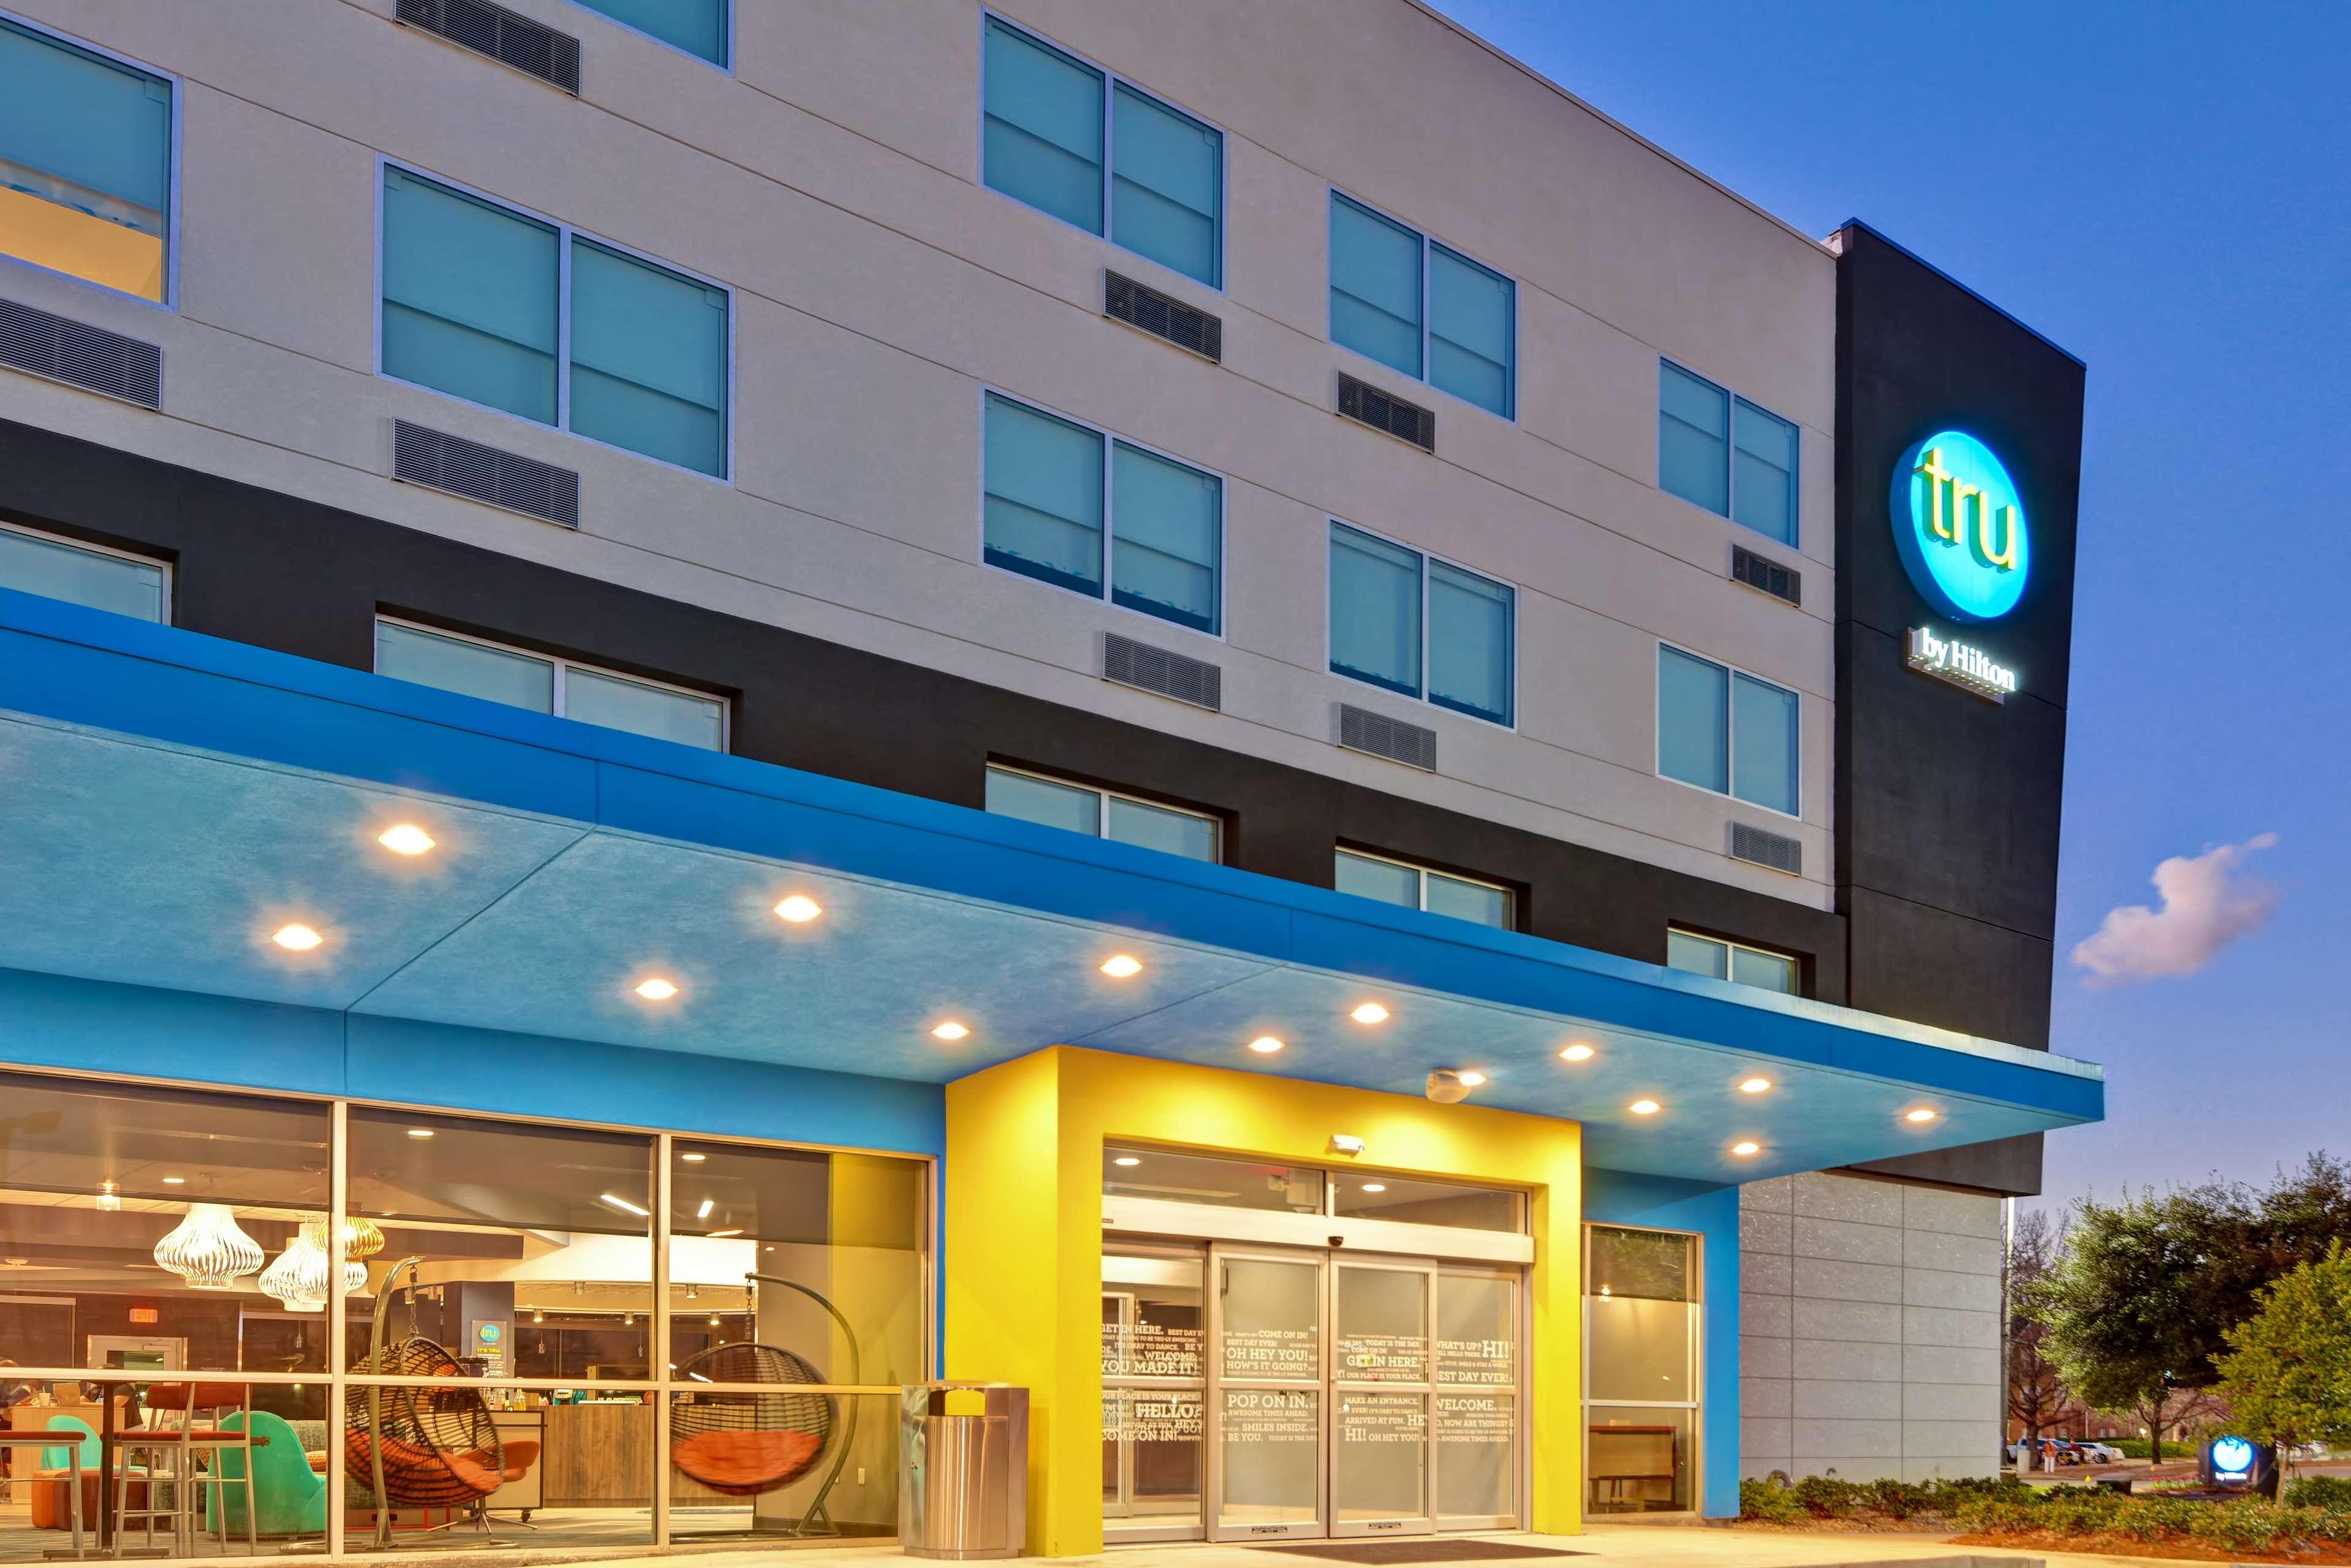 Tru by Hilton Baton Rouge Citiplace image 0